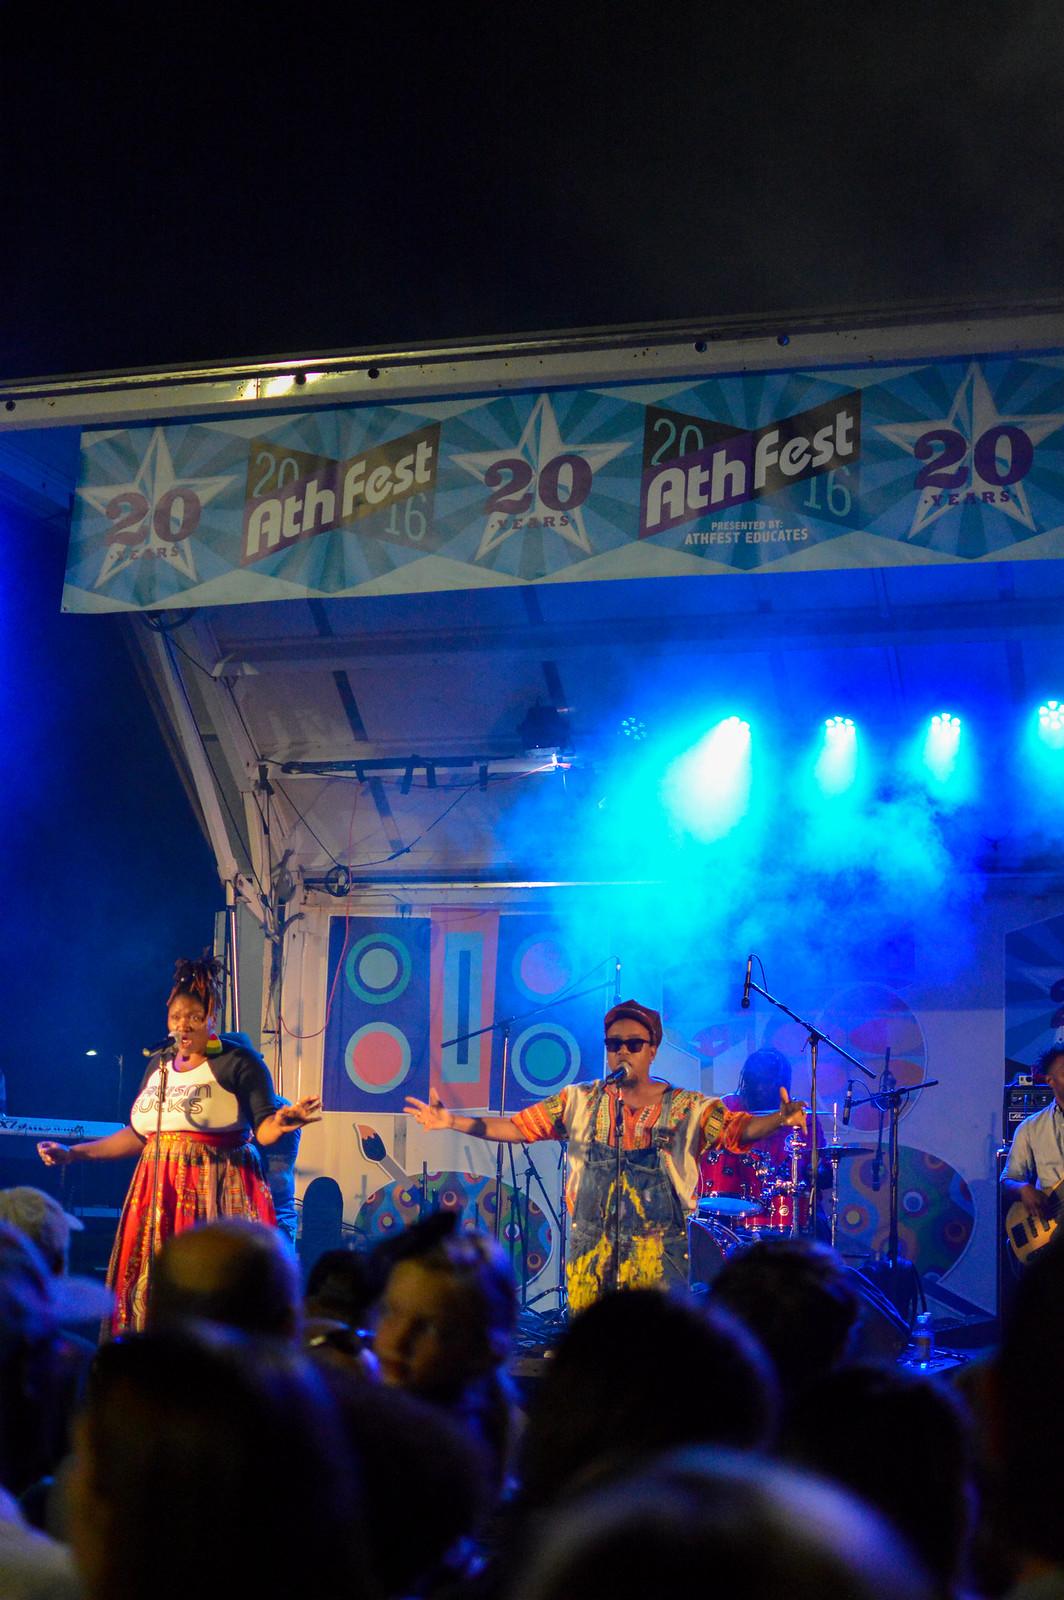 AthFest 2016